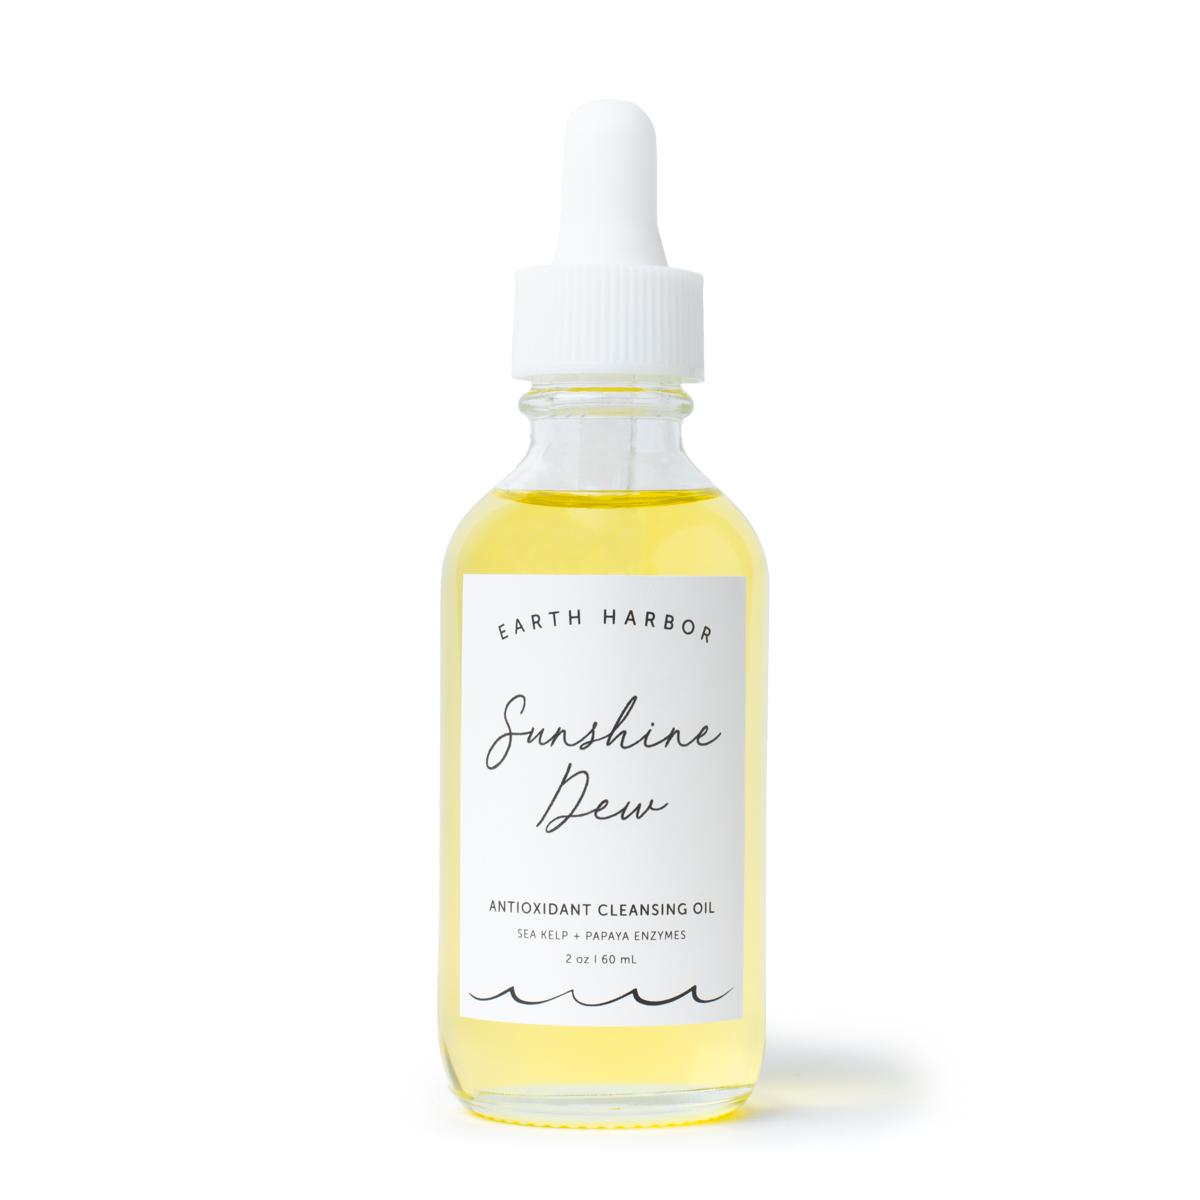 Sunshine Dew Antioxidant Cleansing Oil